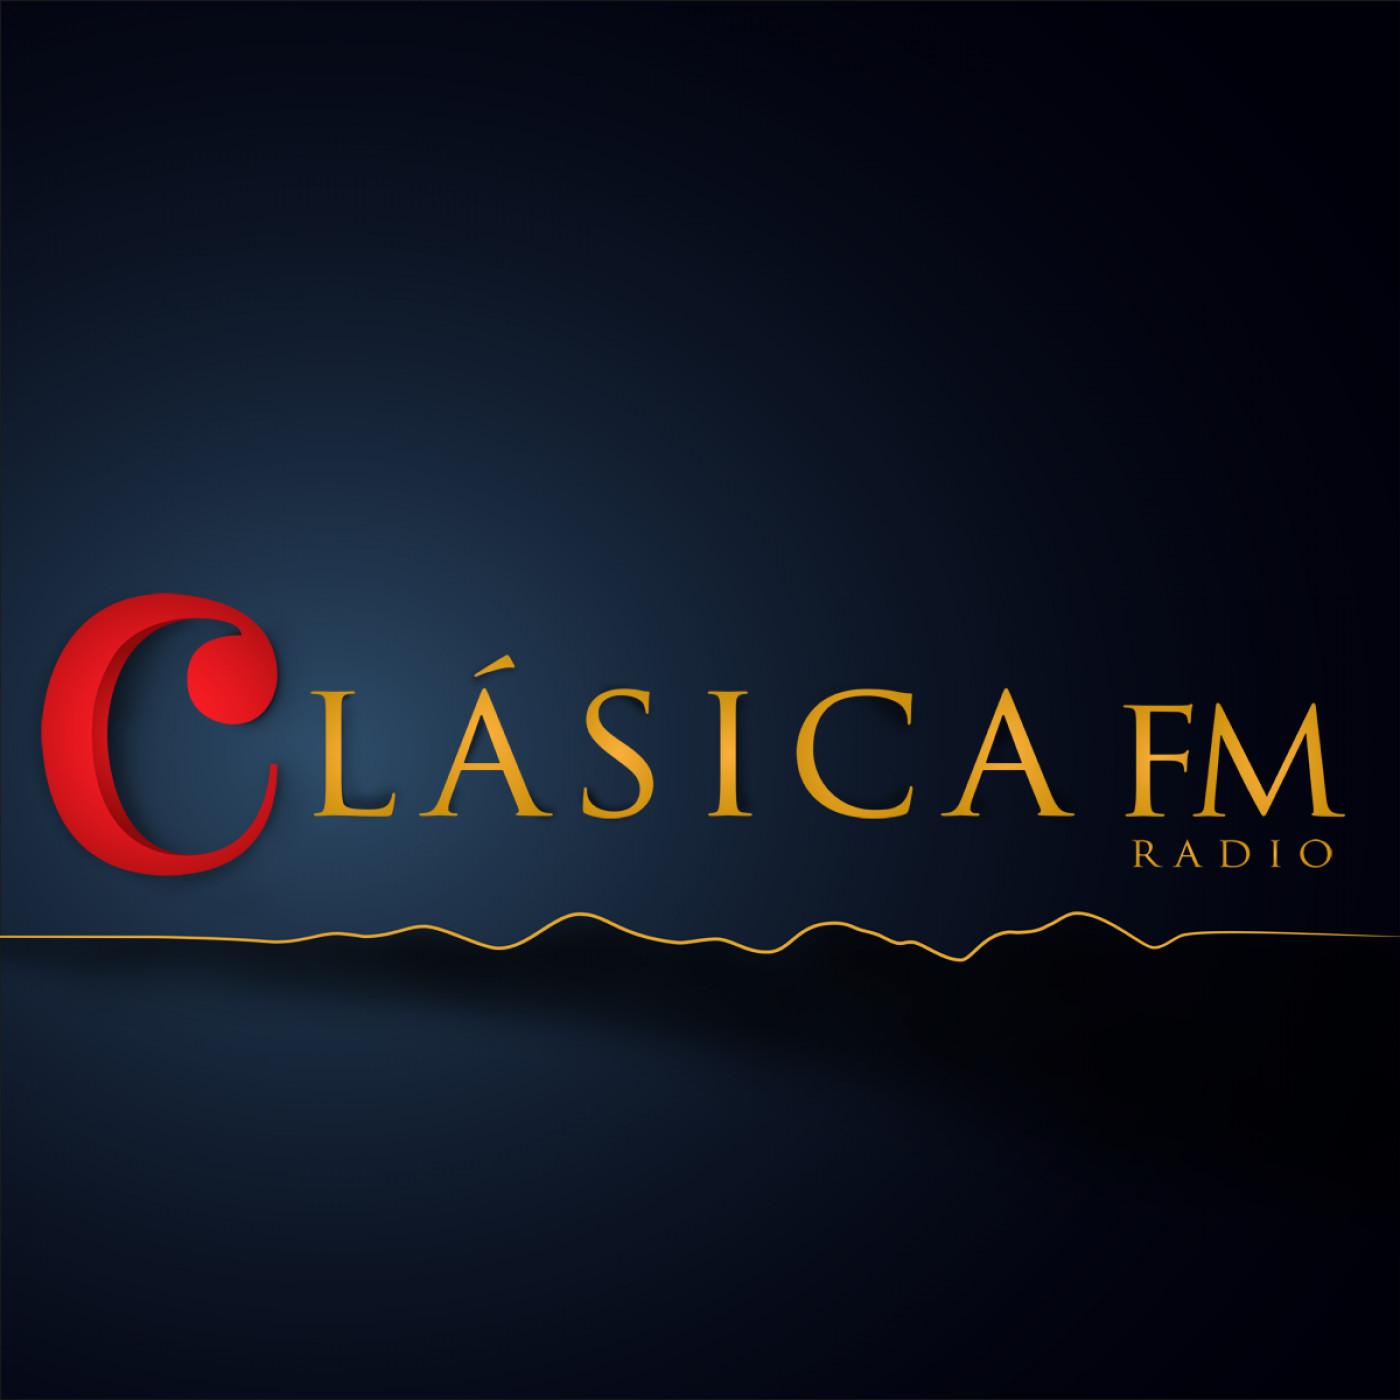 <![CDATA[Clásica FM Radio]]>